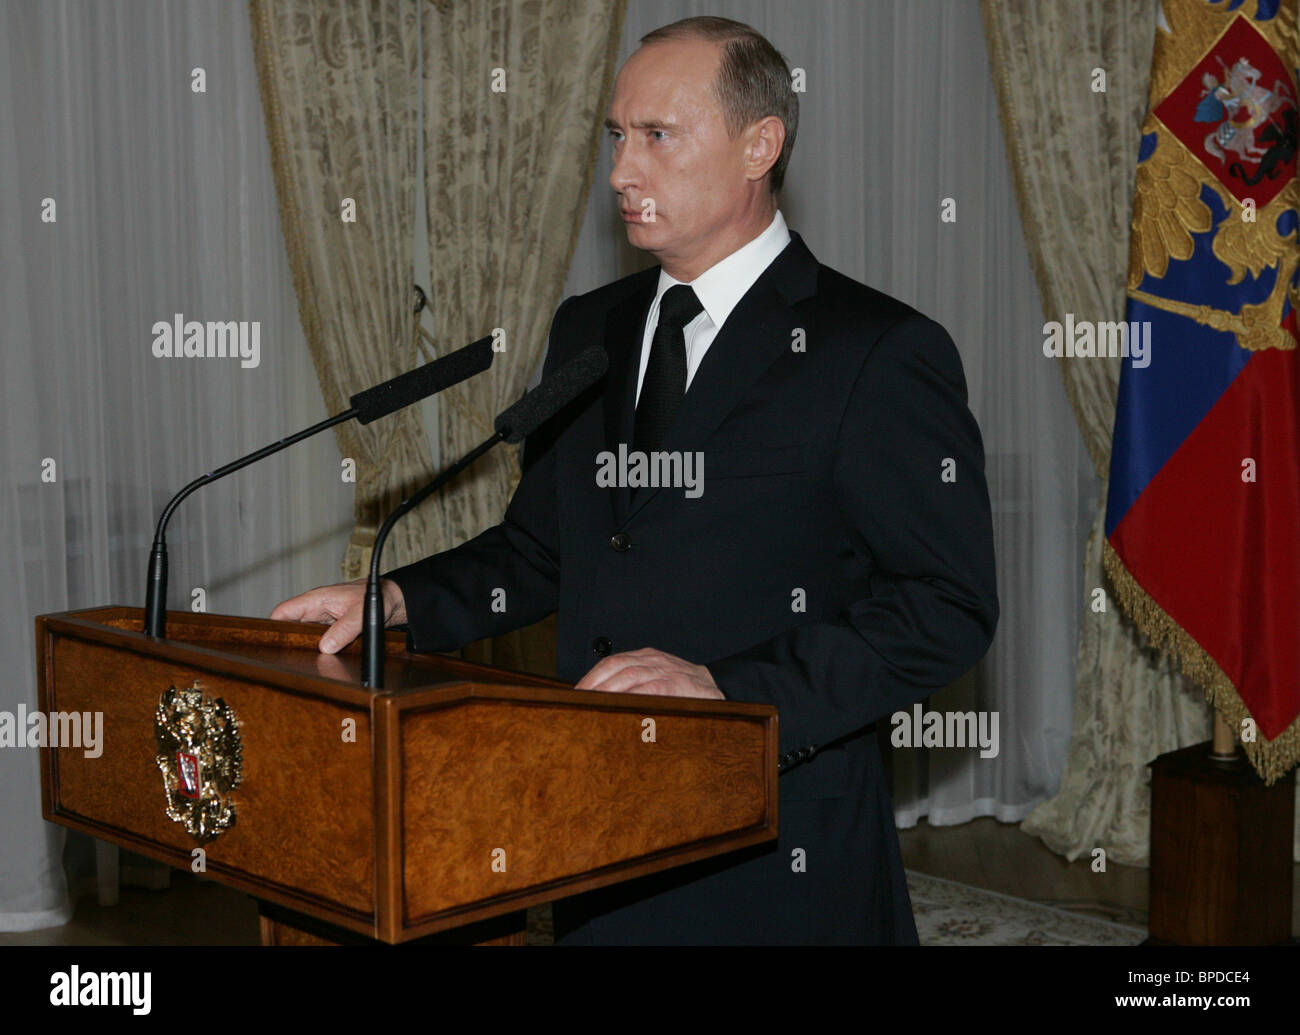 President Putin holds series of meetings in Novo-Ogaryovo residence April 23, 2007 - Stock Image